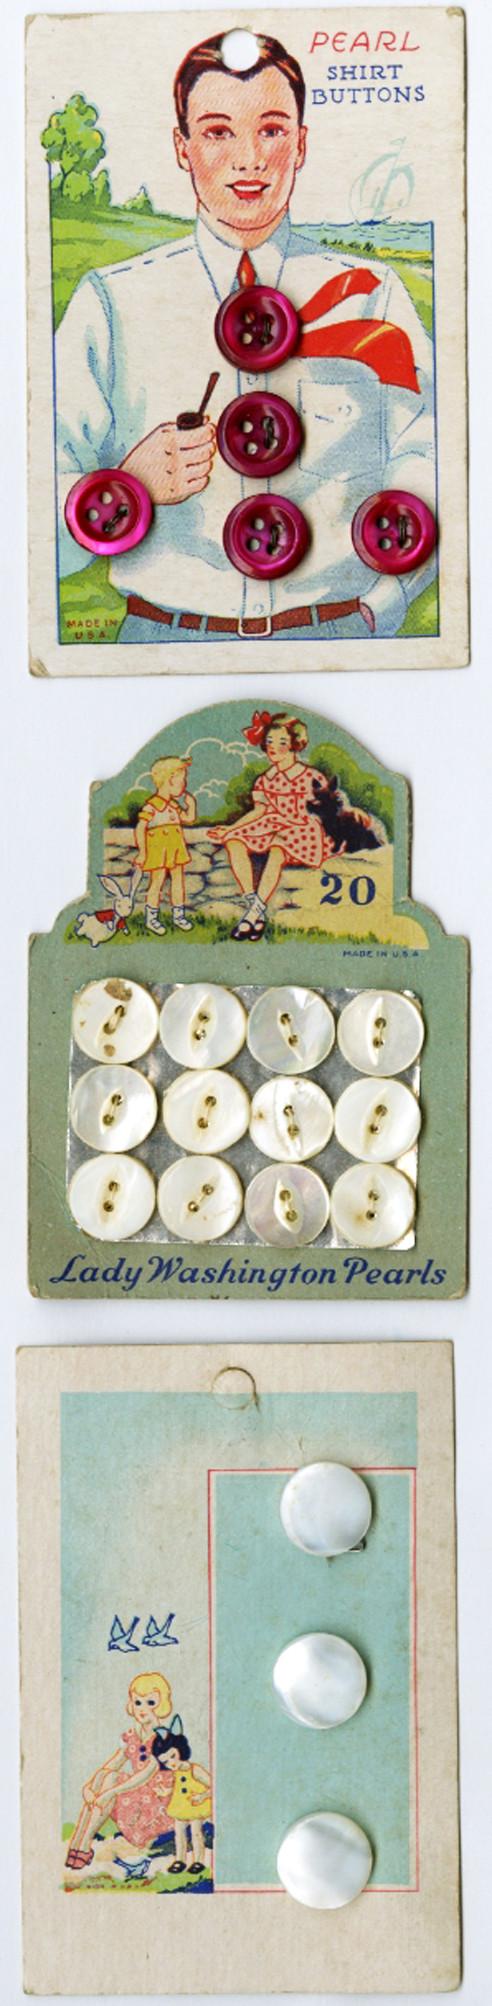 Pearl Shirt Buttons